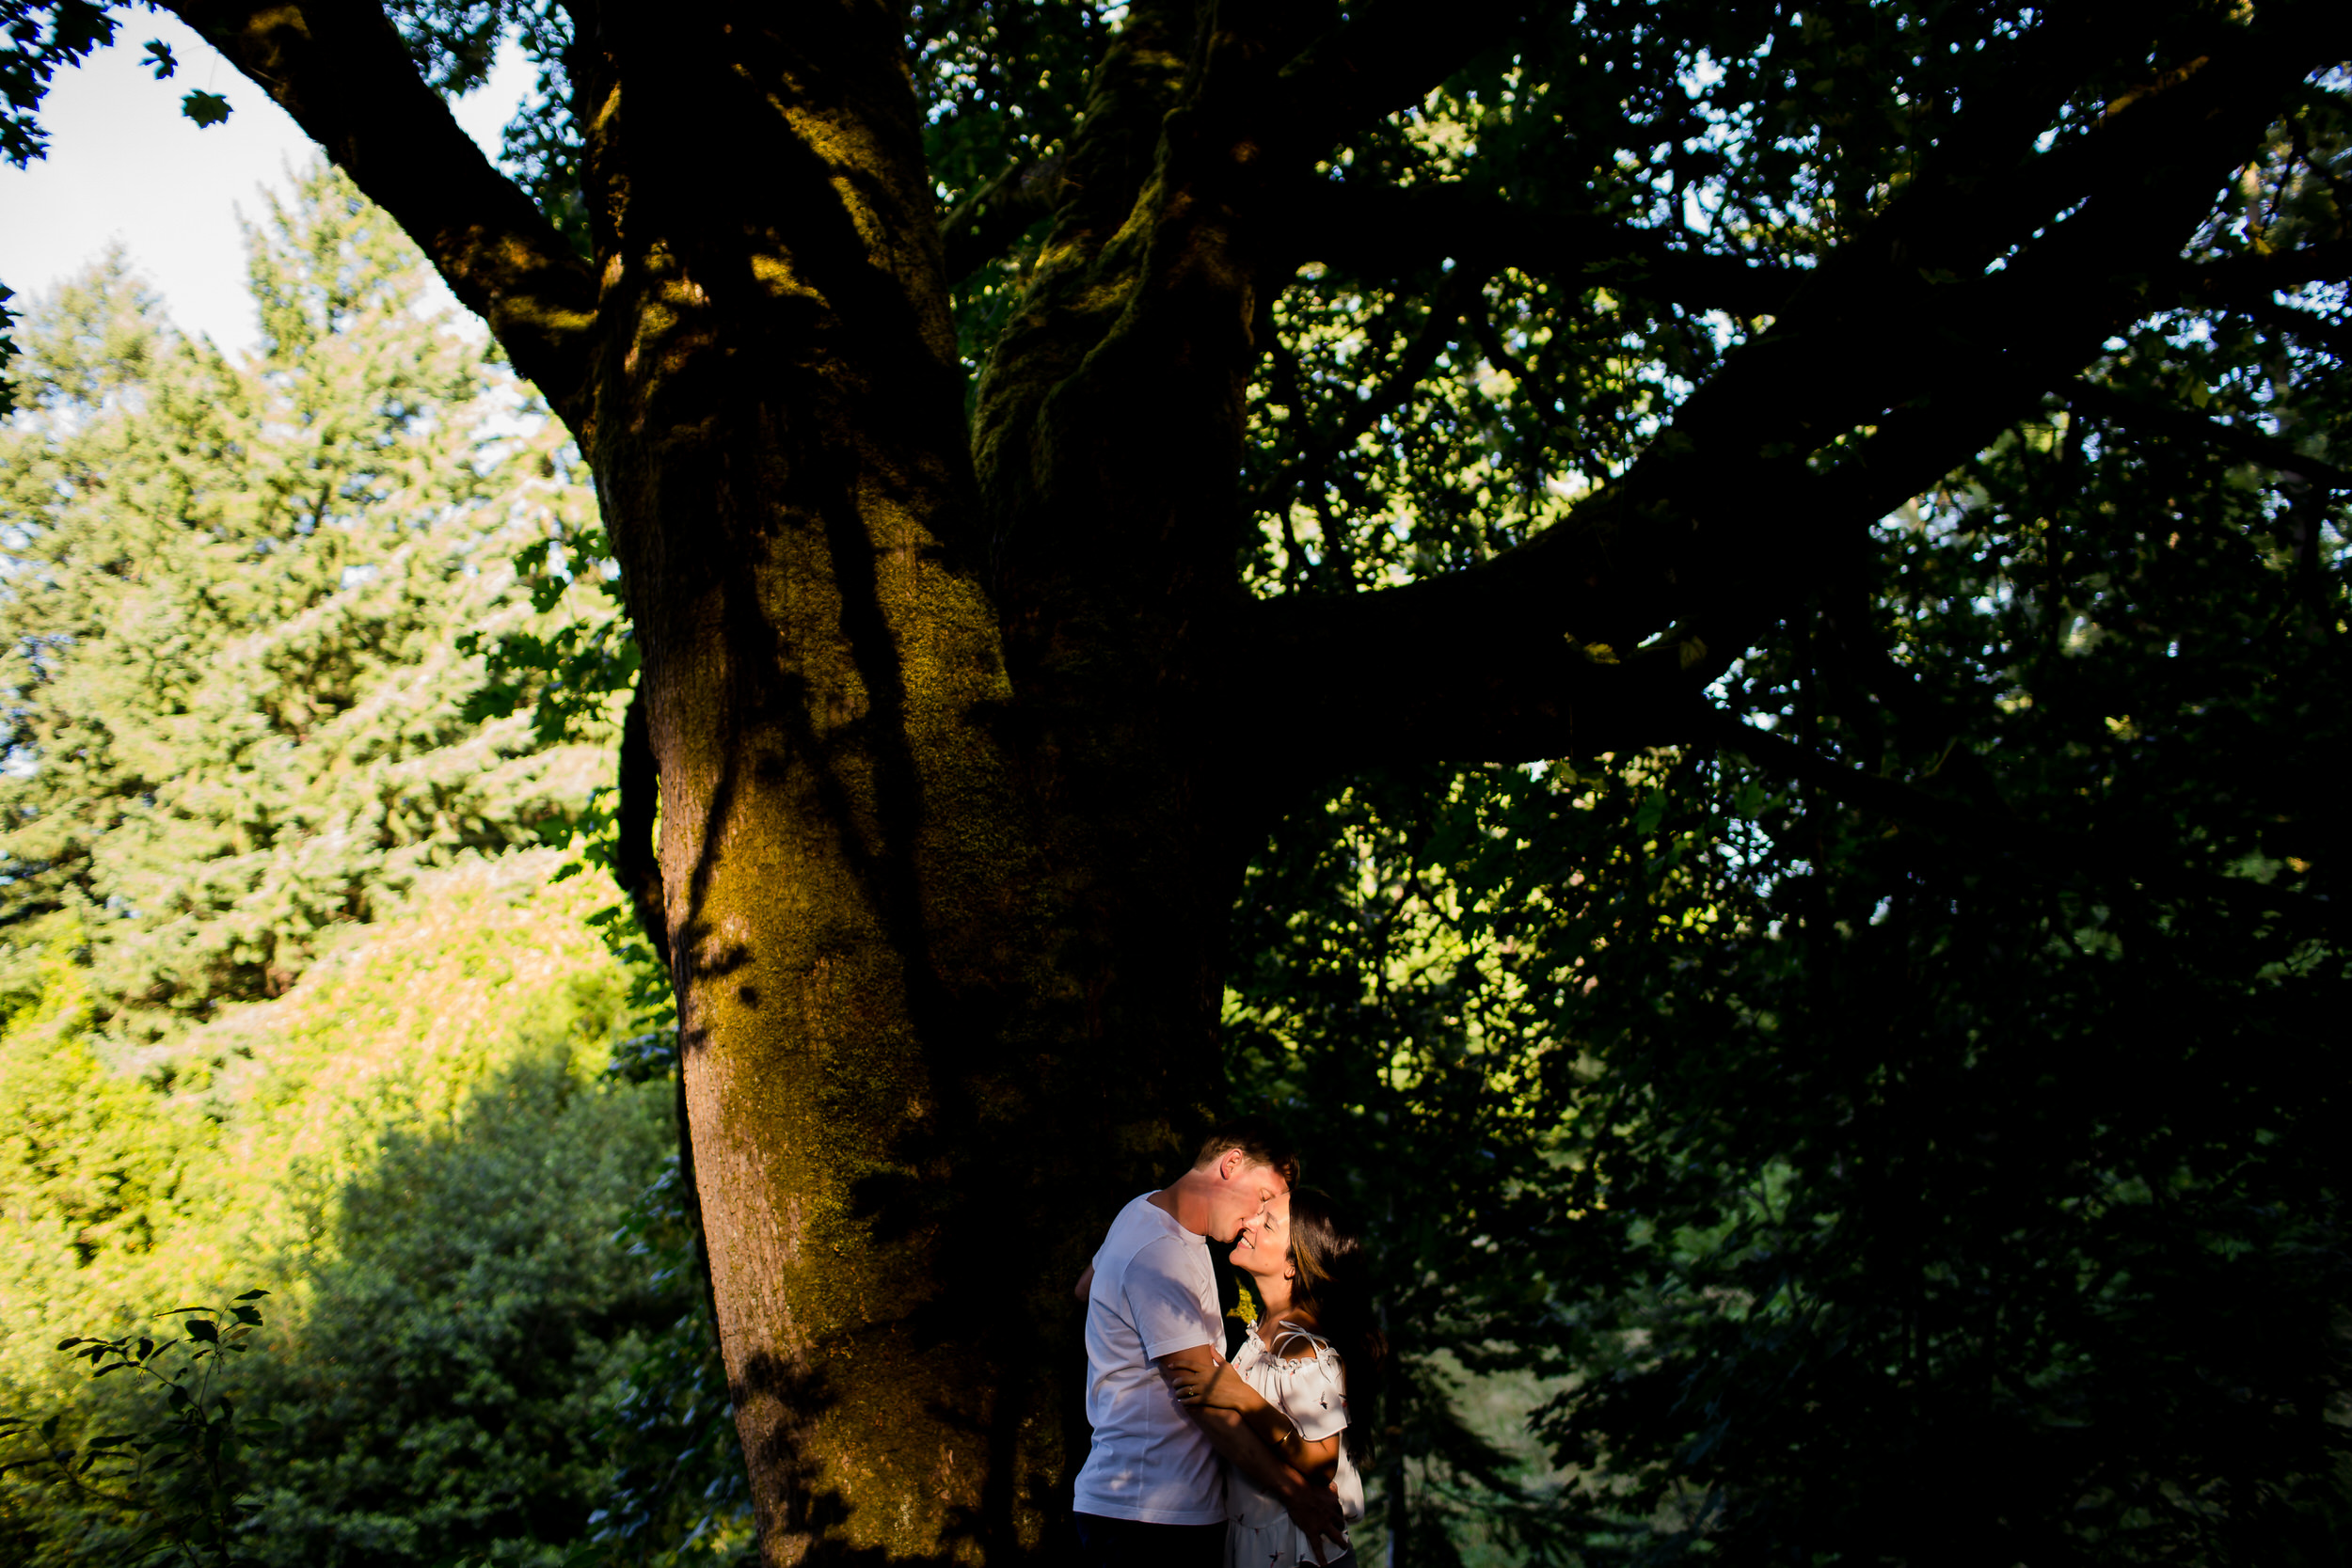 hoyt arboretum portland engagement shoot photos 009